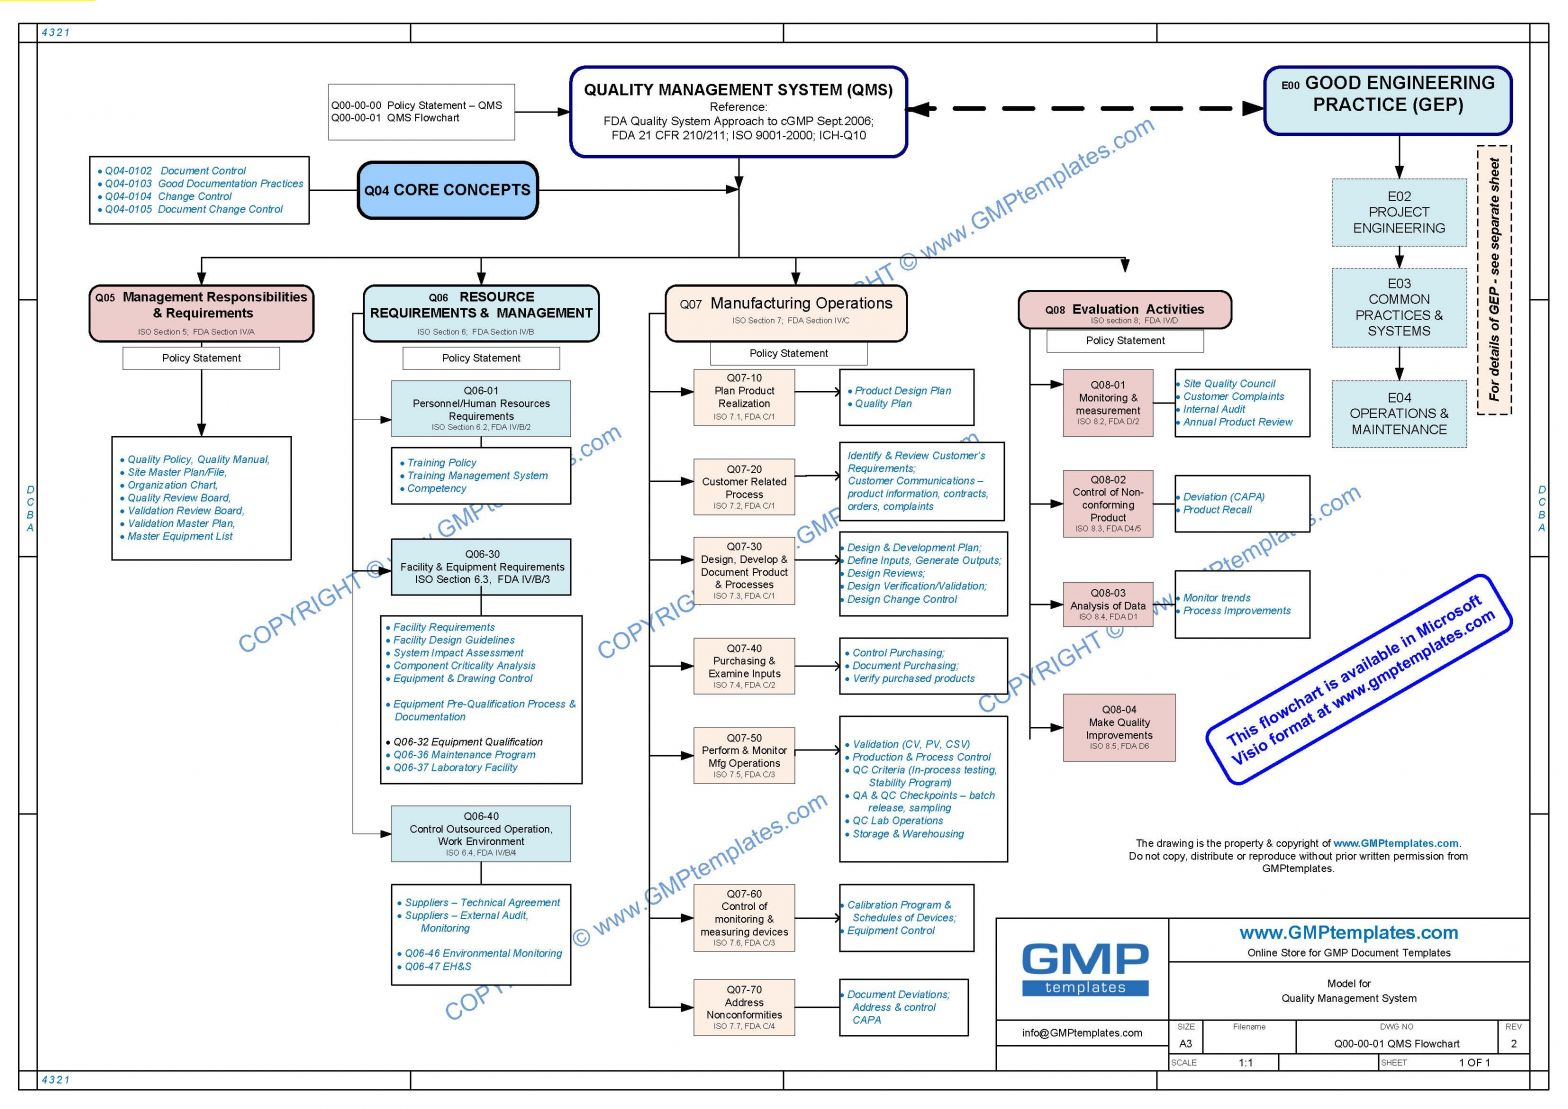 Visio Process Flow Diagram Template Download